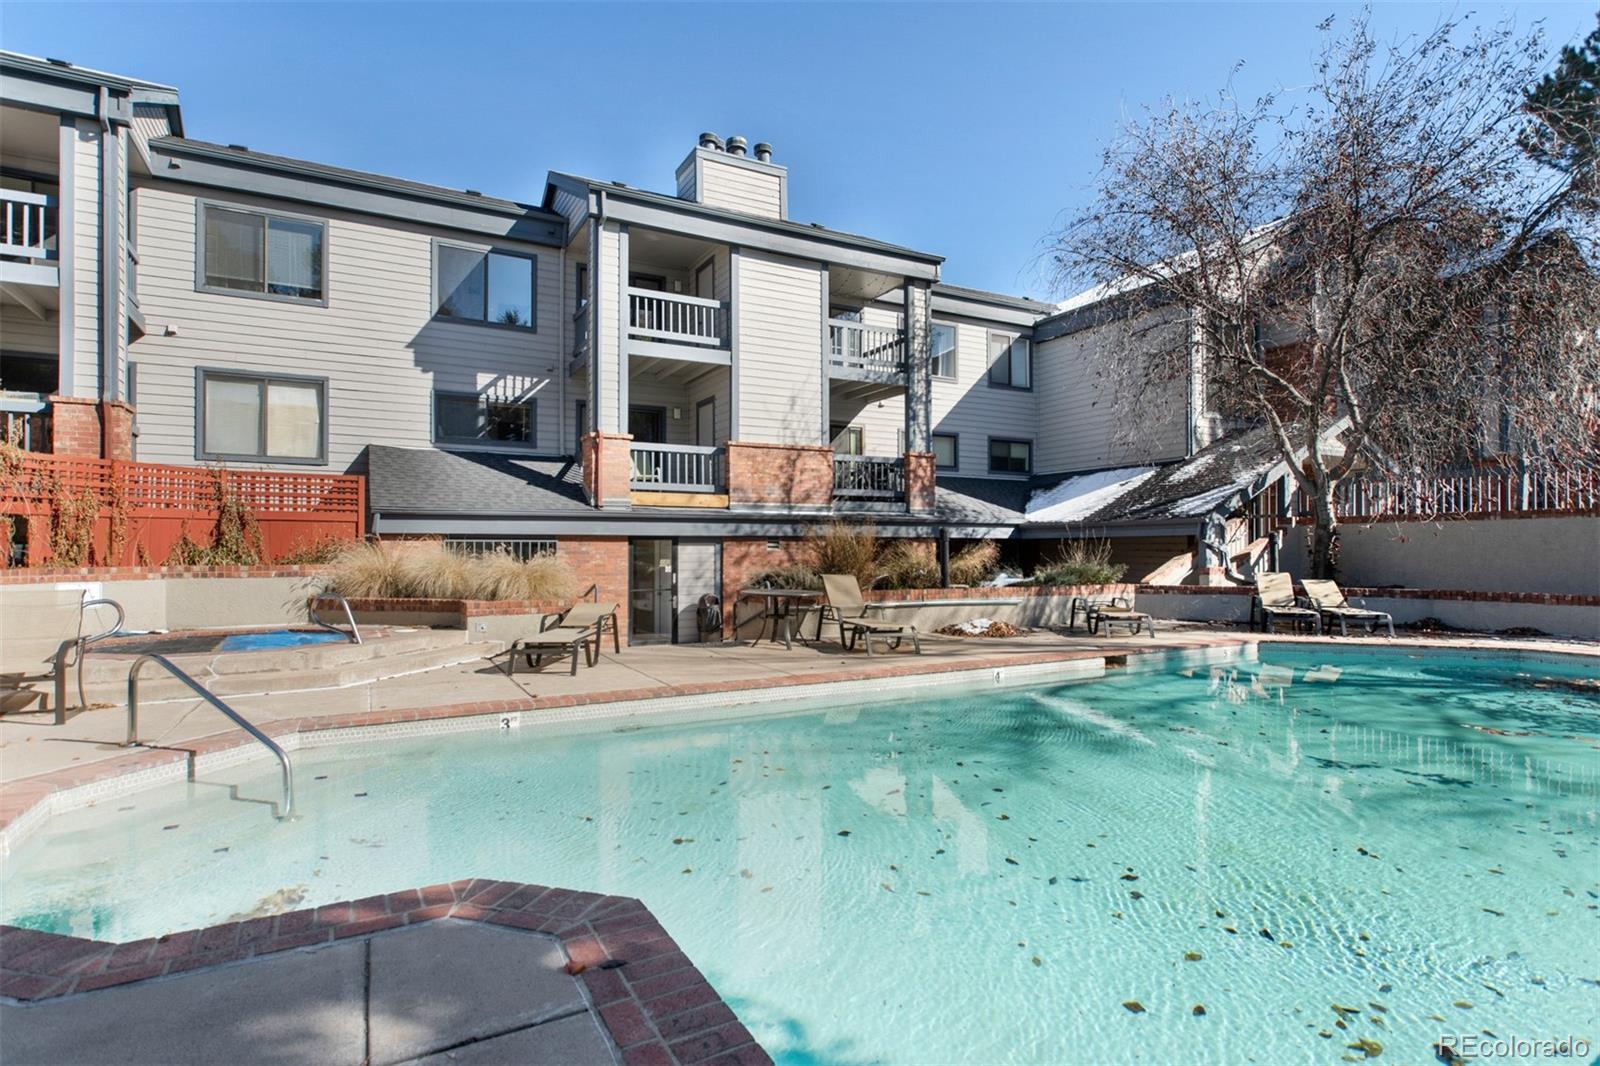 MLS# 3826145 - 18 - 2727 Folsom Street #123, Boulder, CO 80304